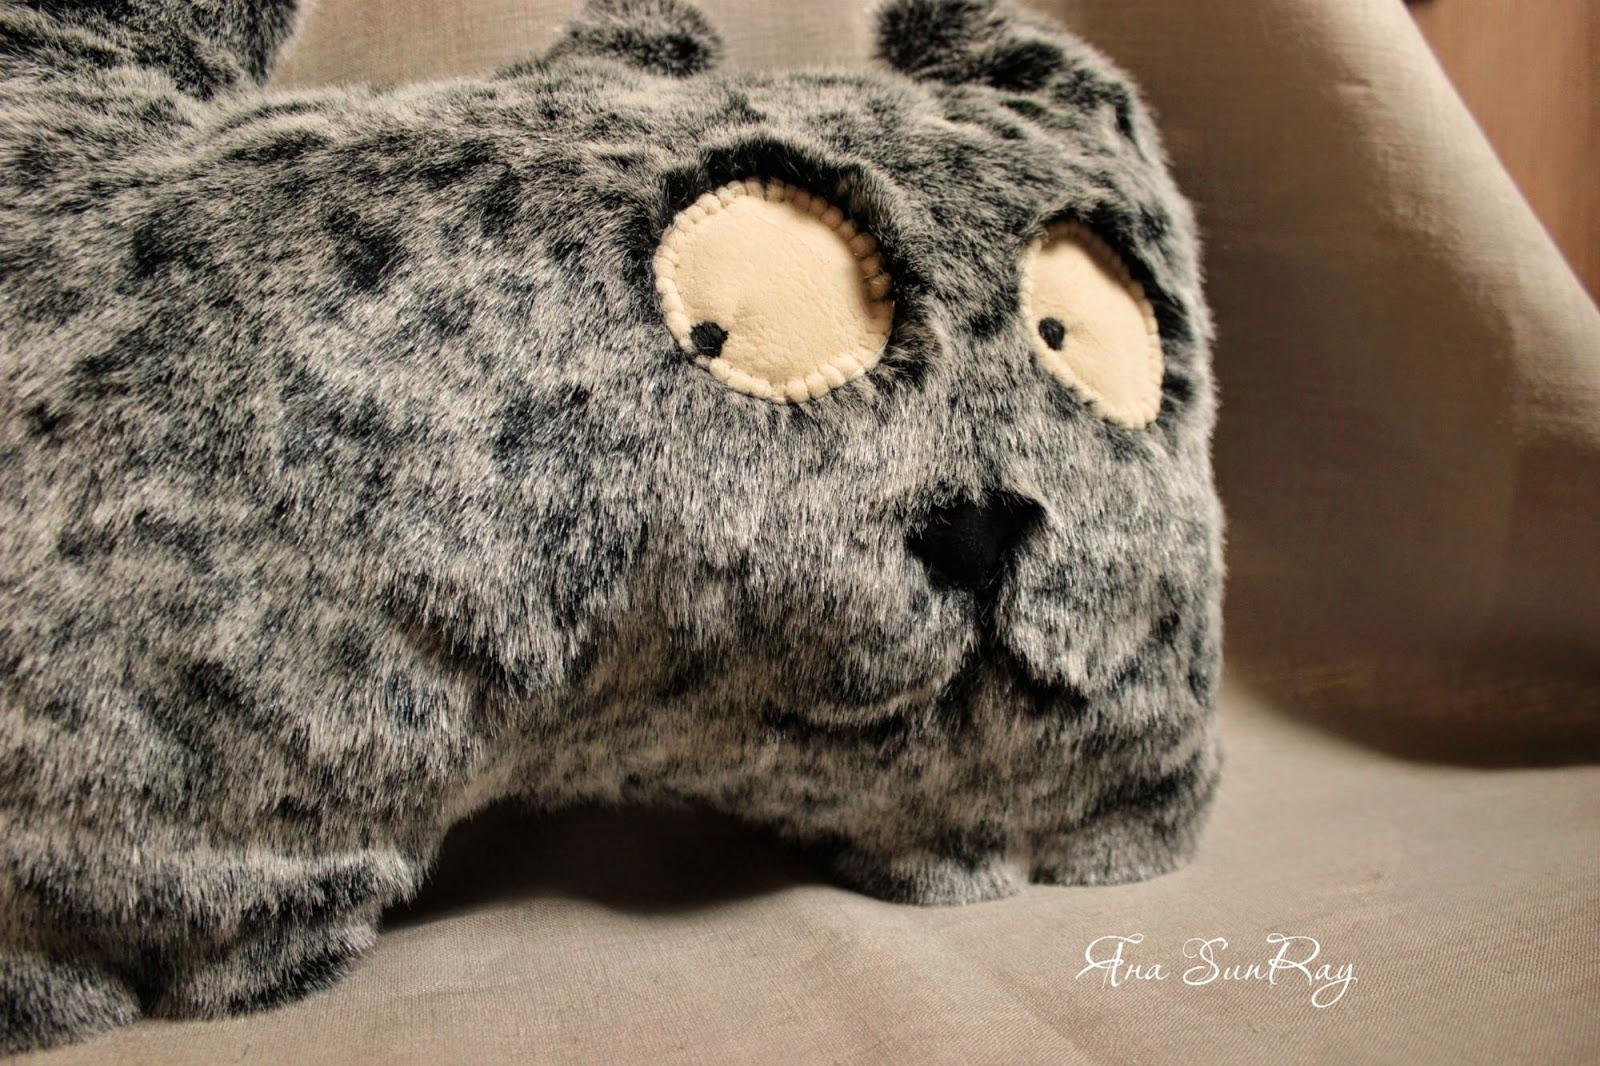 котик, подушка, кот, подушка валик, подушка под голову, подушка в форме кота, игрушка своими руками, забавный котик,   котик выкройка, кот пошив, игрушки из флиса, мягкая игрушка, мягкий кот, смешной кот, забавный котик, подушечка в форме кота